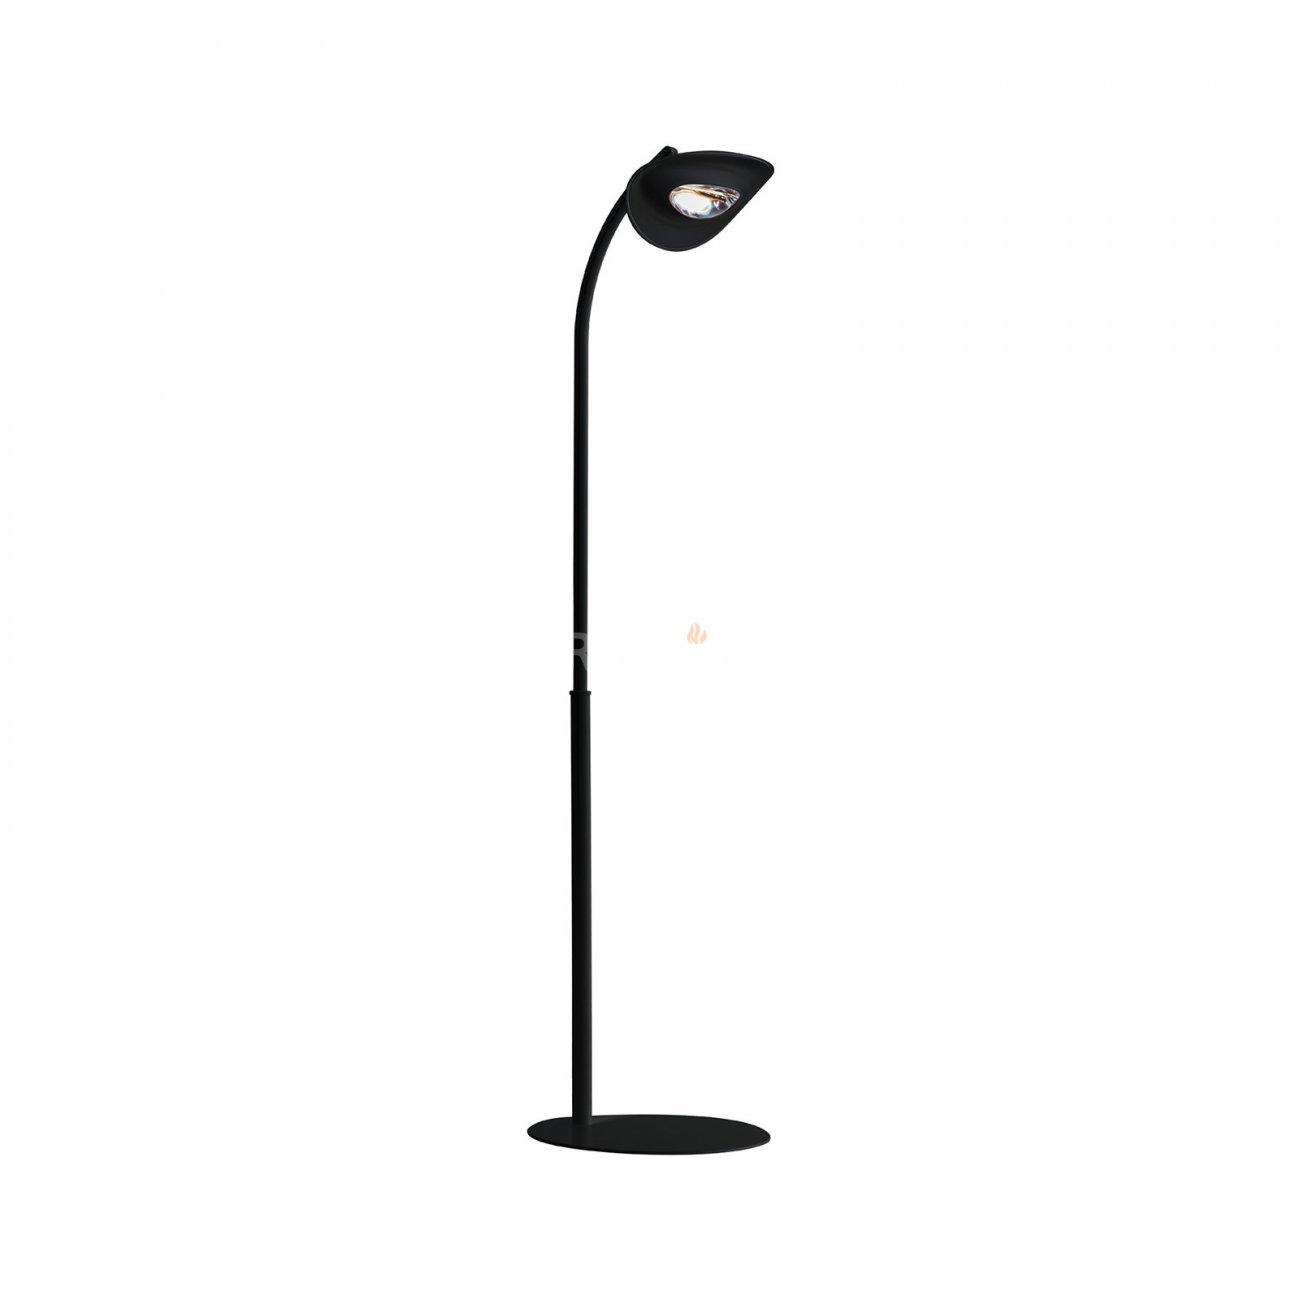 vasner standline 25r infrarot stand heizstrahler schwarz 2500 watt 4 stufen dimmer. Black Bedroom Furniture Sets. Home Design Ideas